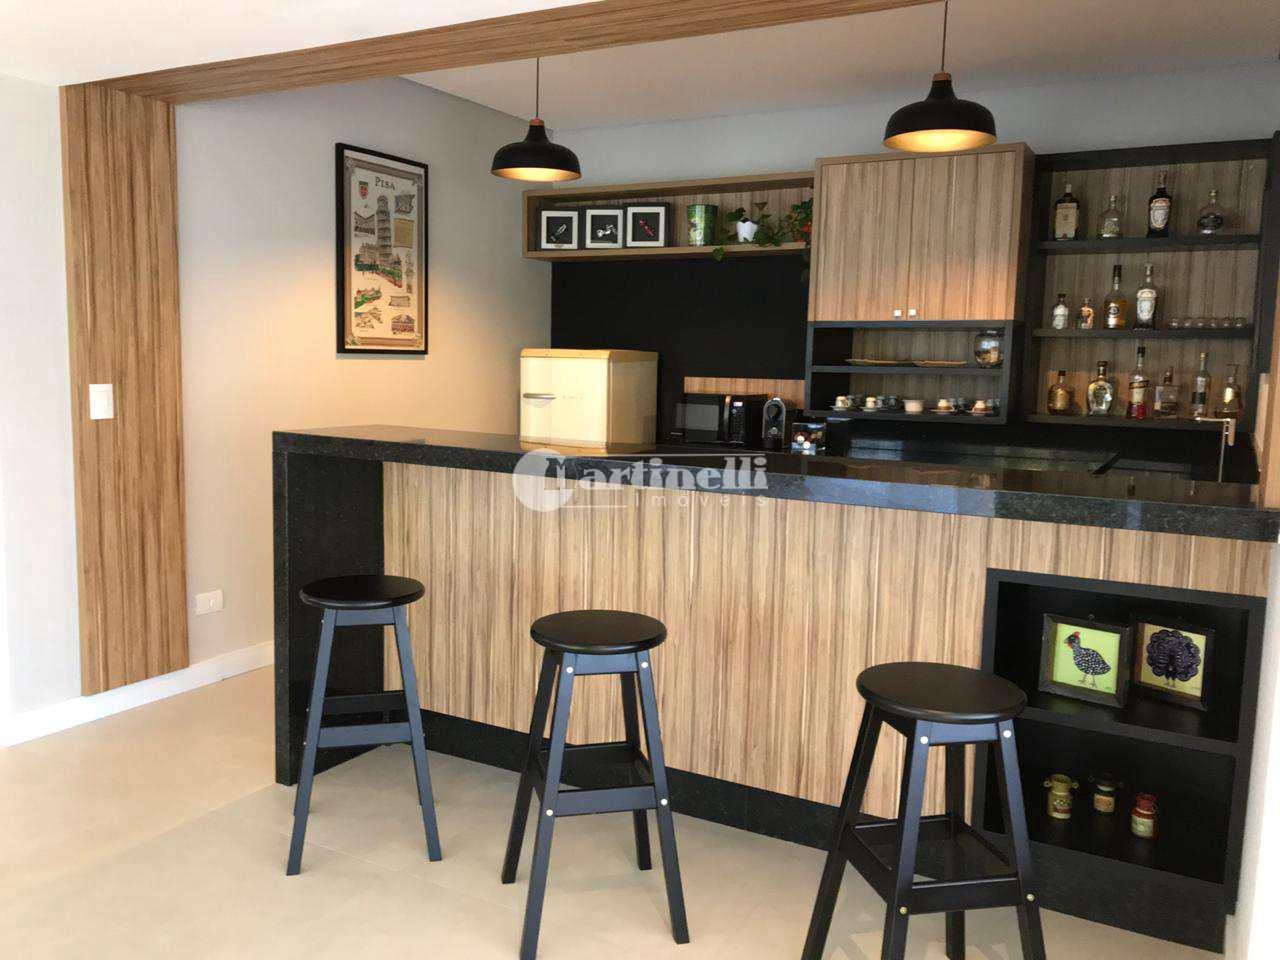 Casa de Condomínio com 4 dorms, Zona Rural, Santo Antônio do Pinhal - R$ 2.6 mi, Cod: 491